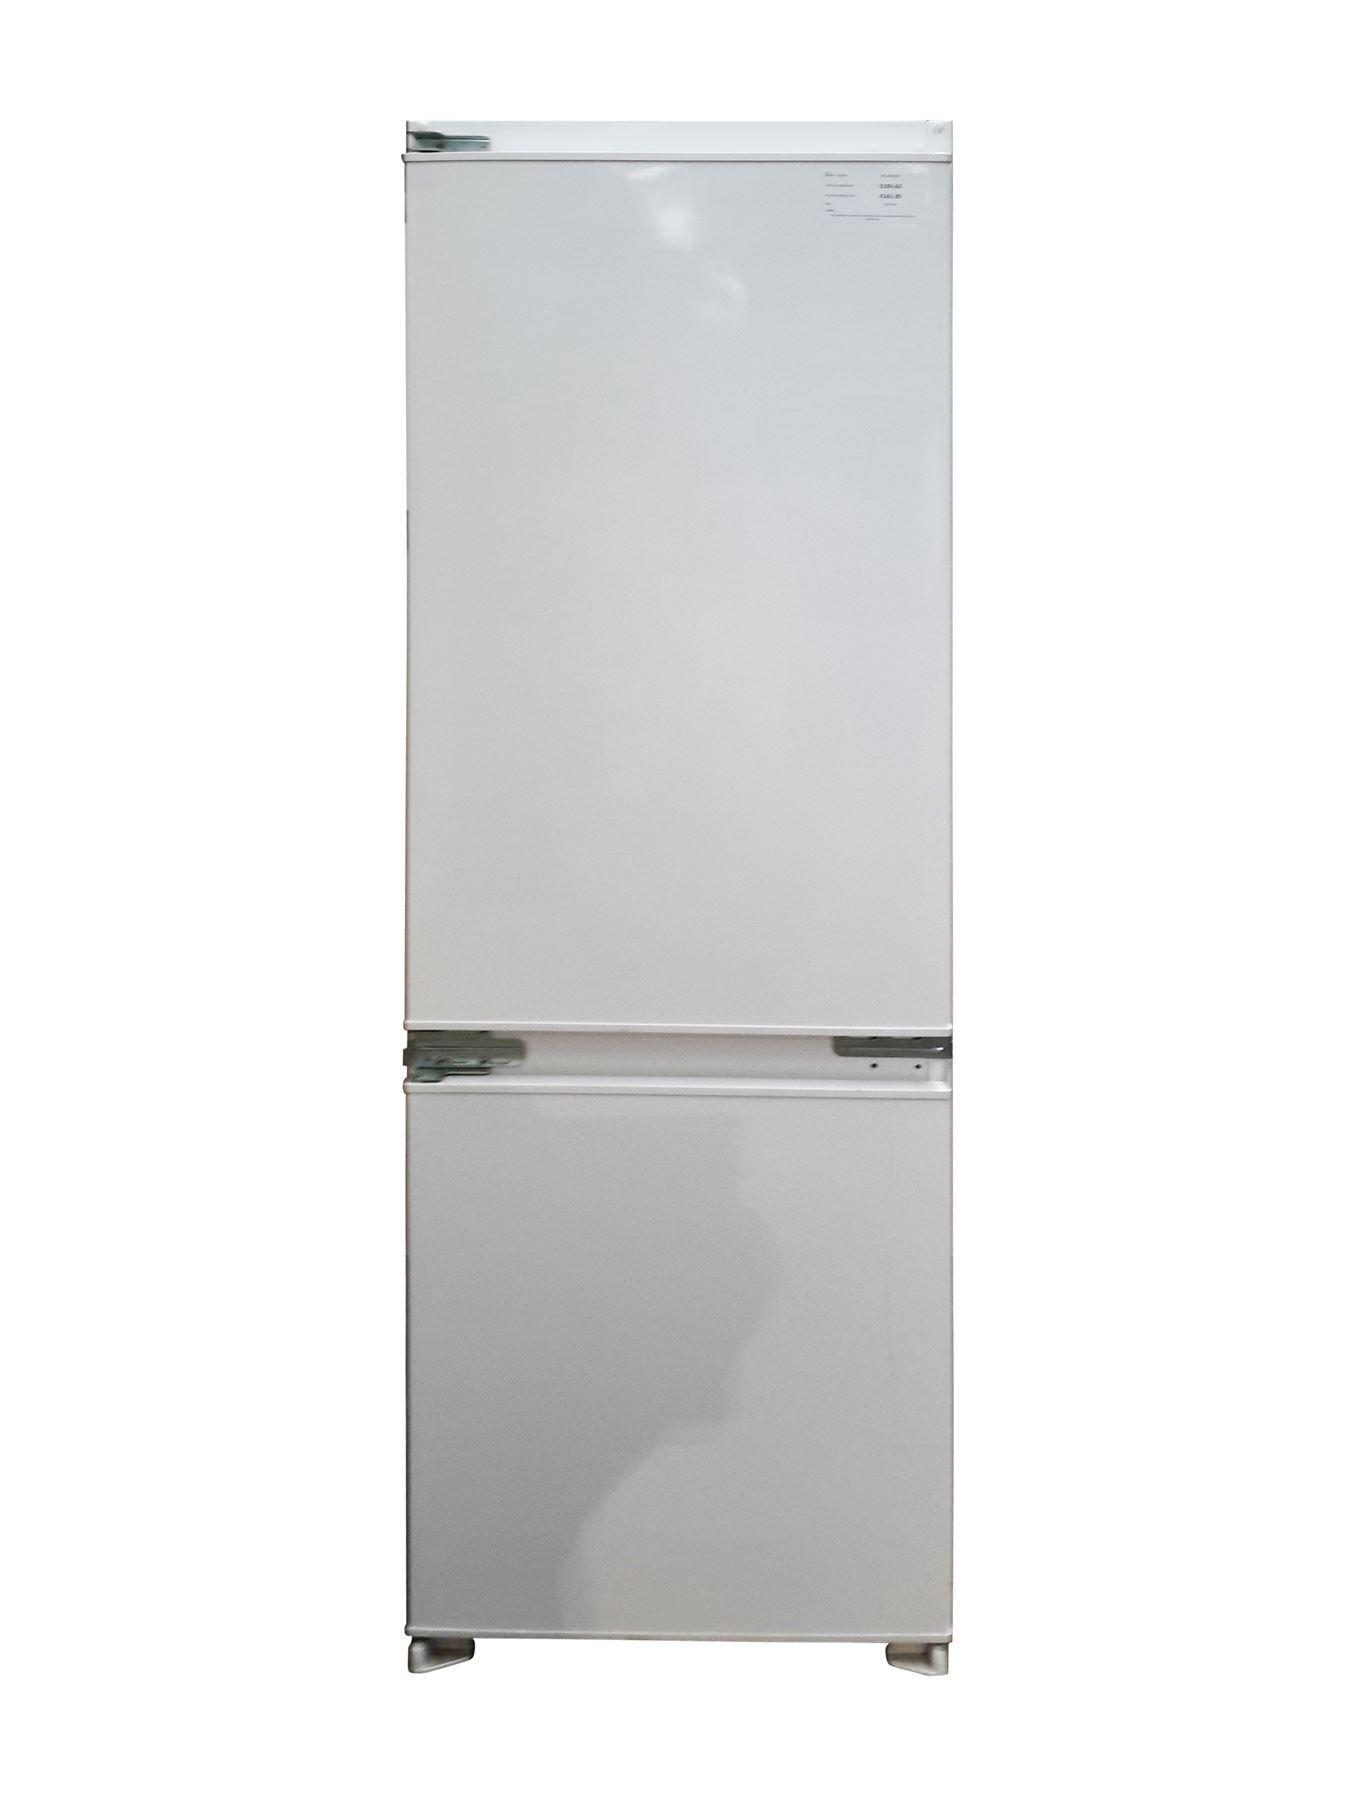 Belling B5050Ff 50 50 Frost Free Integrated Fridge Freezer, White